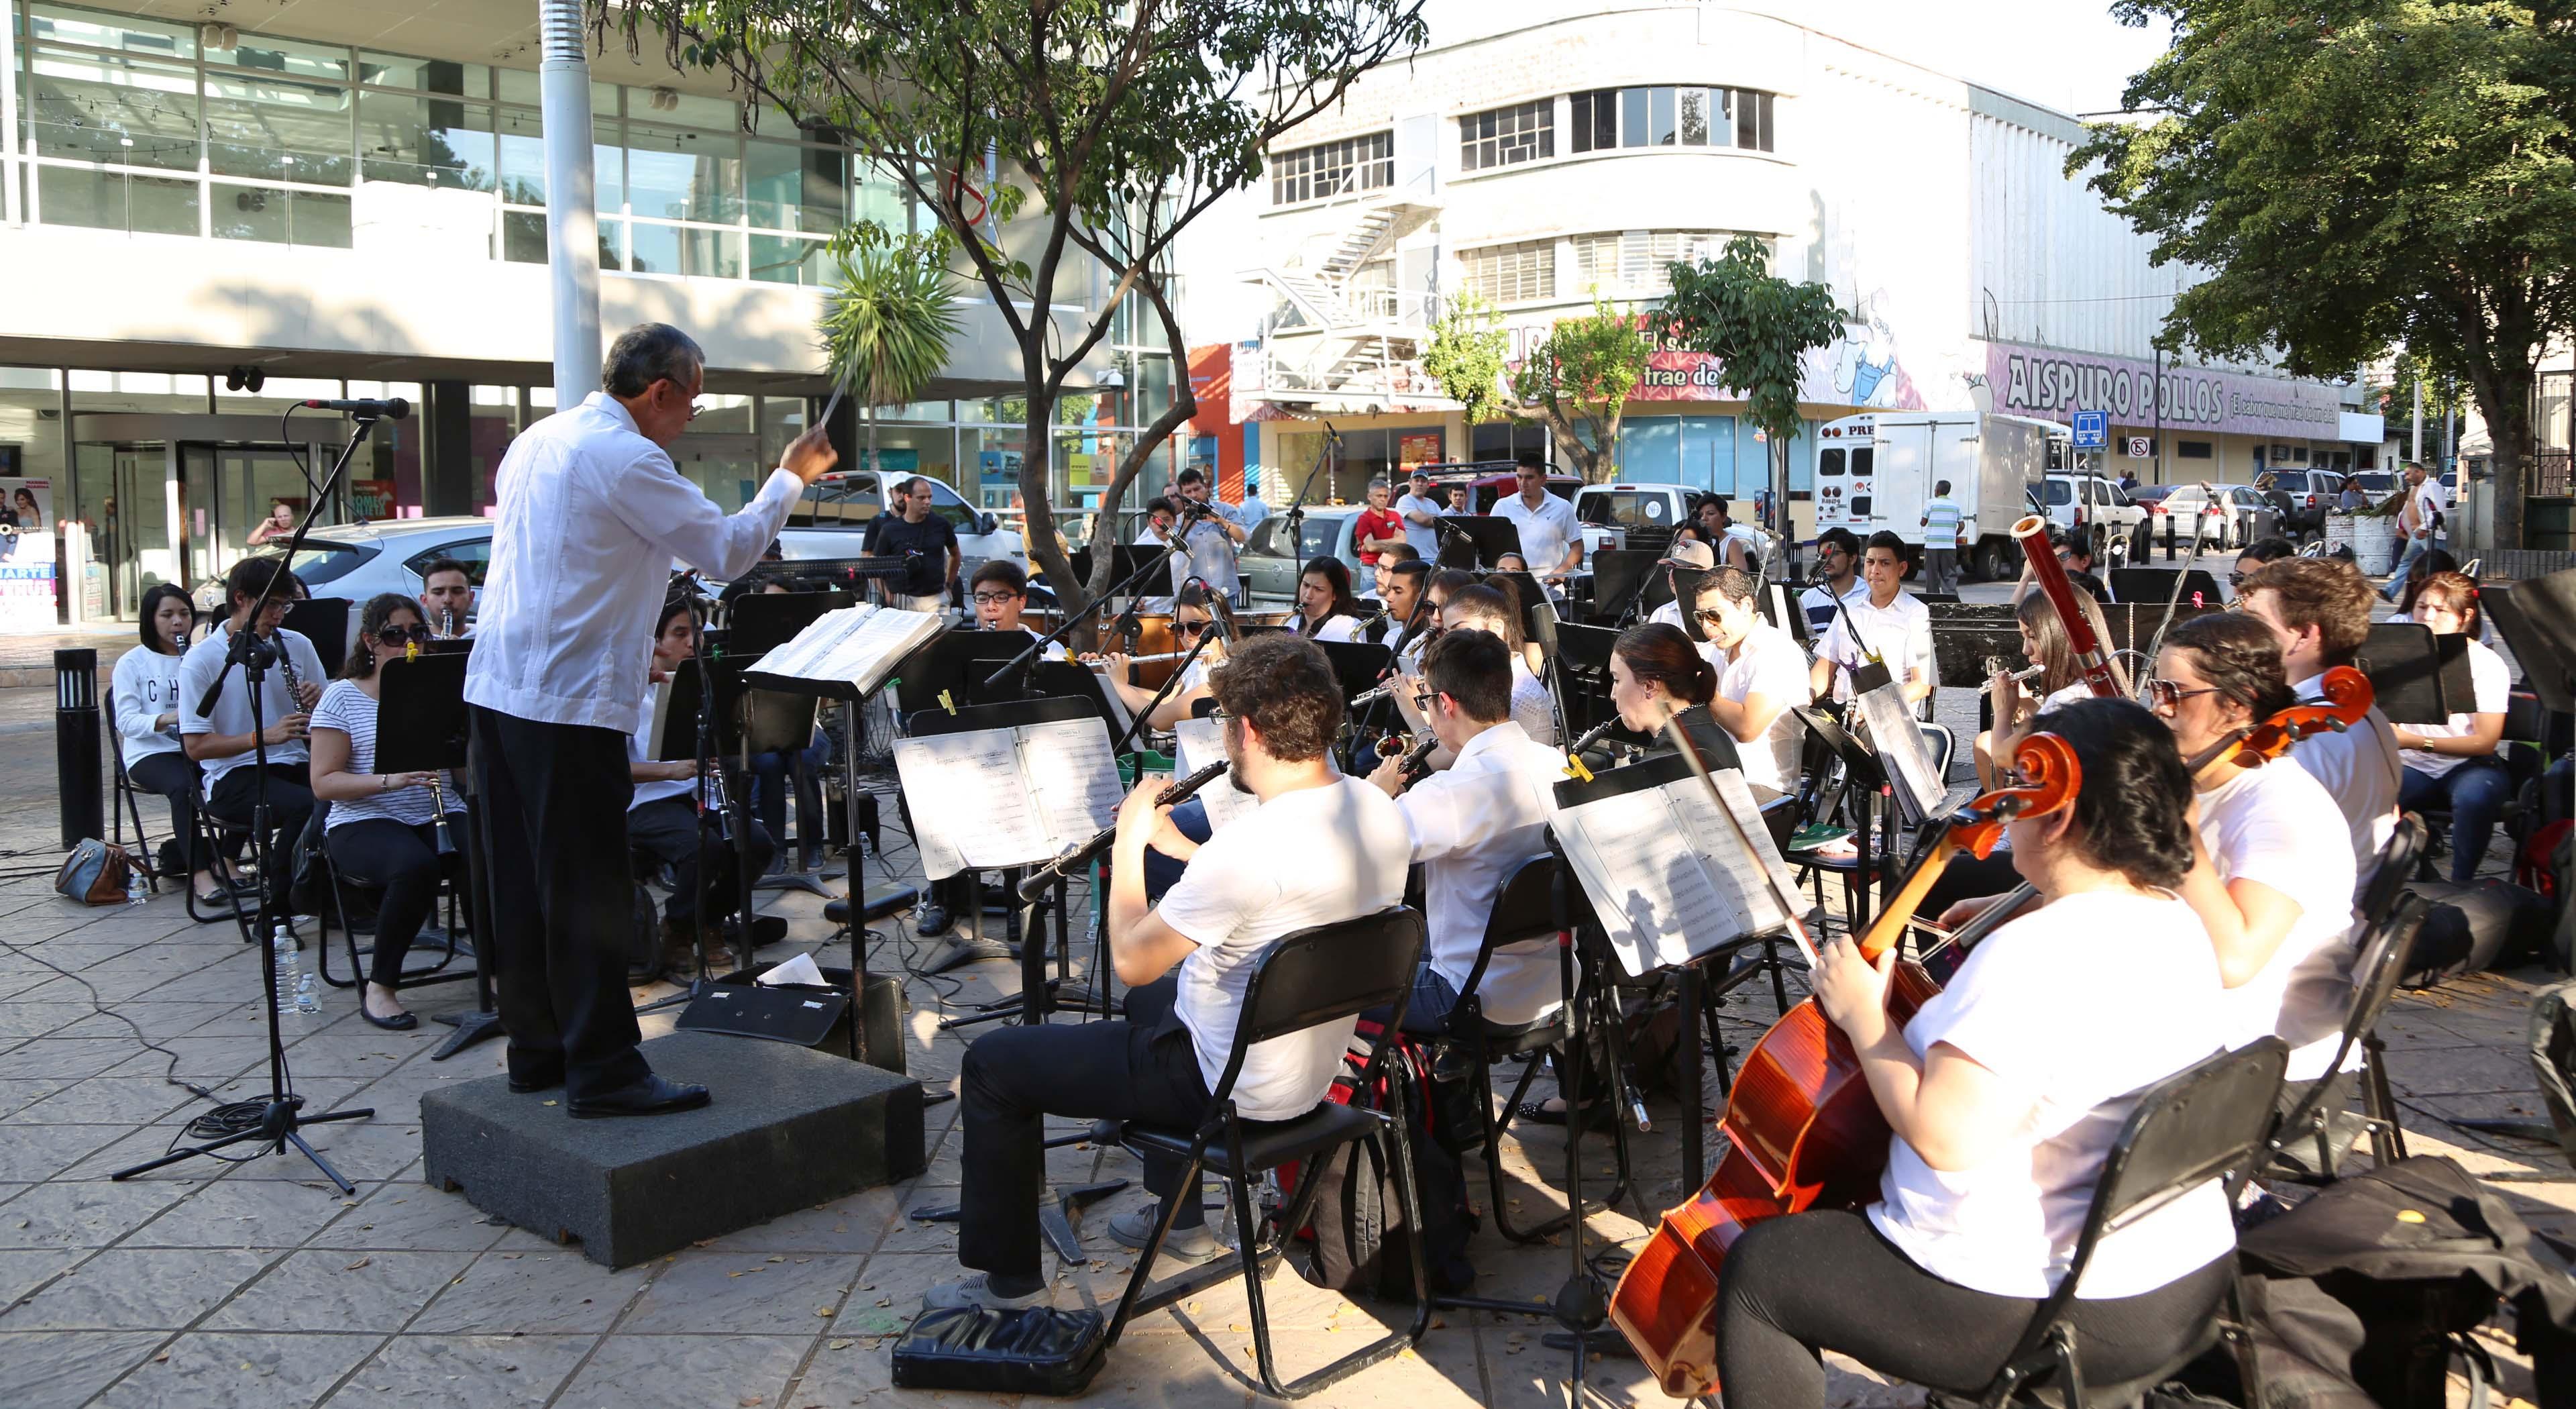 Con música mexicana e infantil, este viernes 13 de abril, La Banda toma la Calle